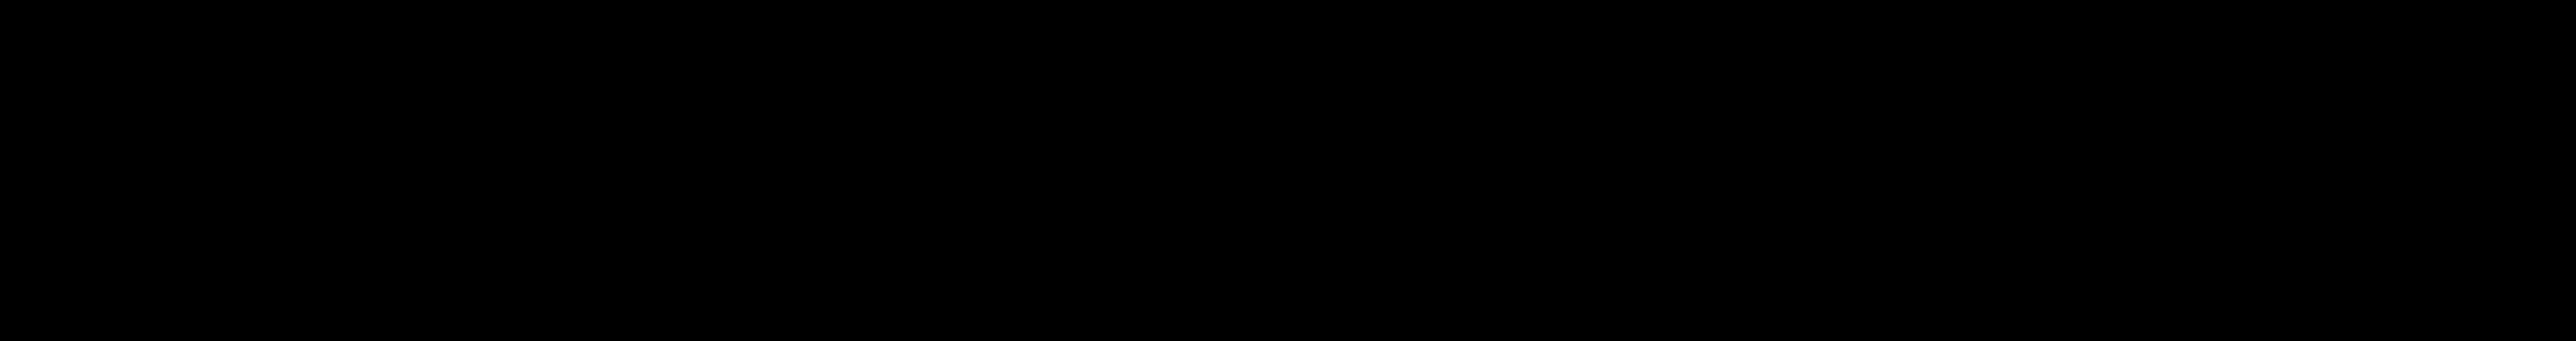 Fullscreen Logo.